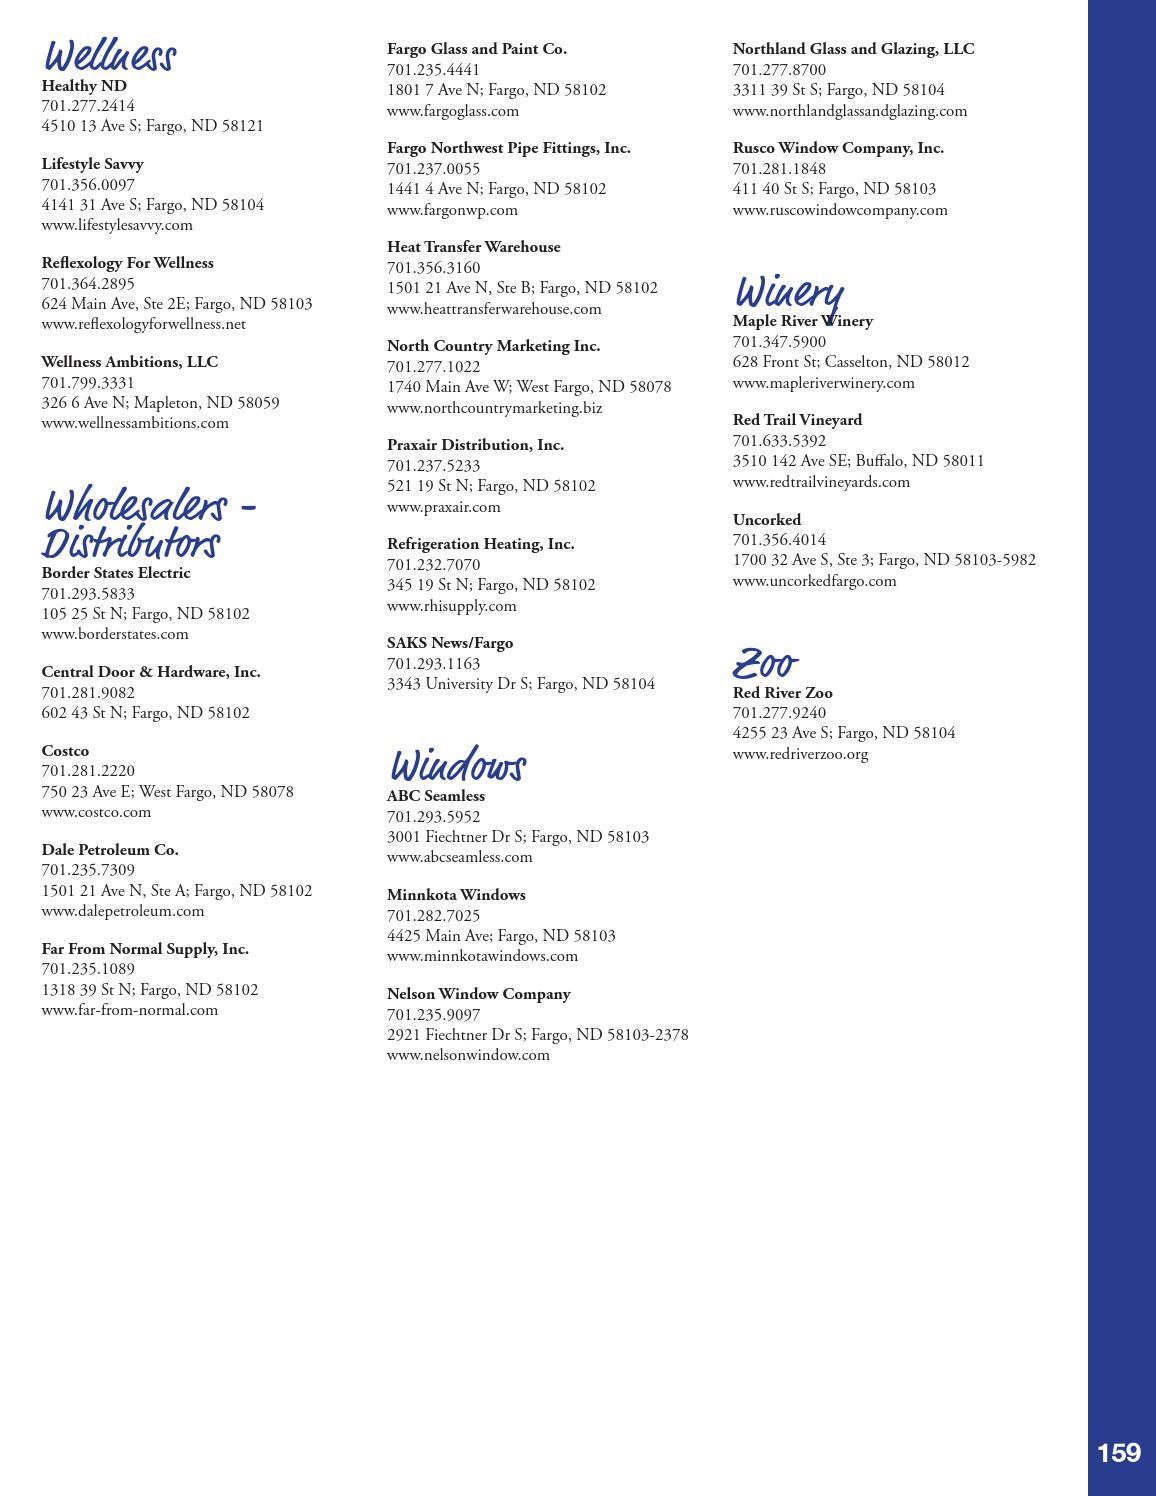 2015 Fargo Moorhead West Fargo Metro Profile & Directory by